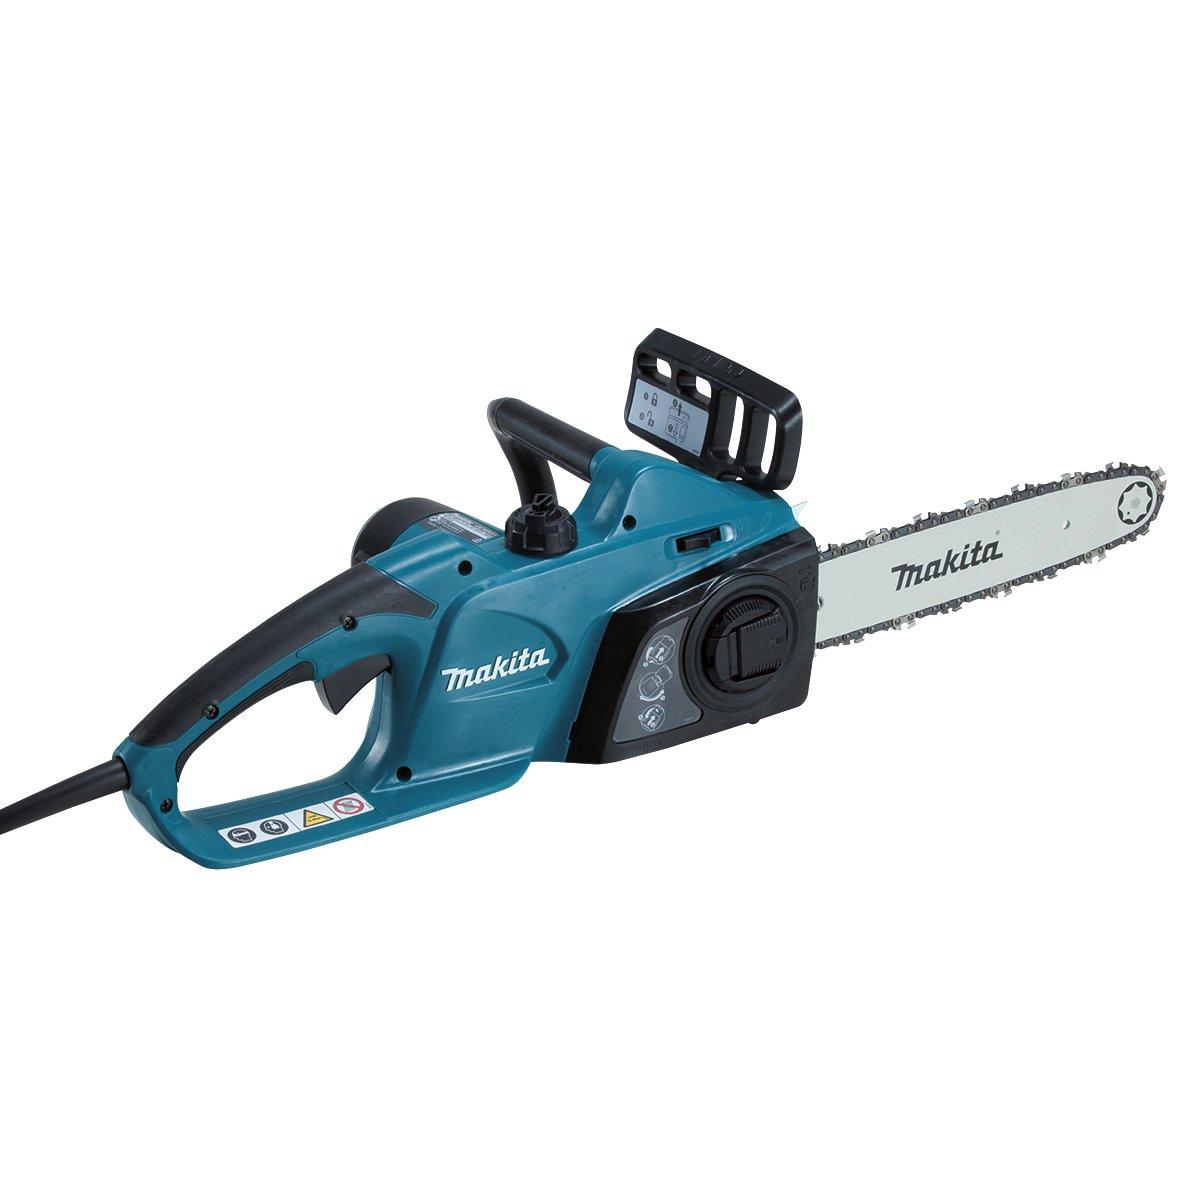 Makita UC4041A 1800W 7820RPM power chainsaw - power chainsaws (76.2 / 8 mm (3 / 8), Black, Blue)